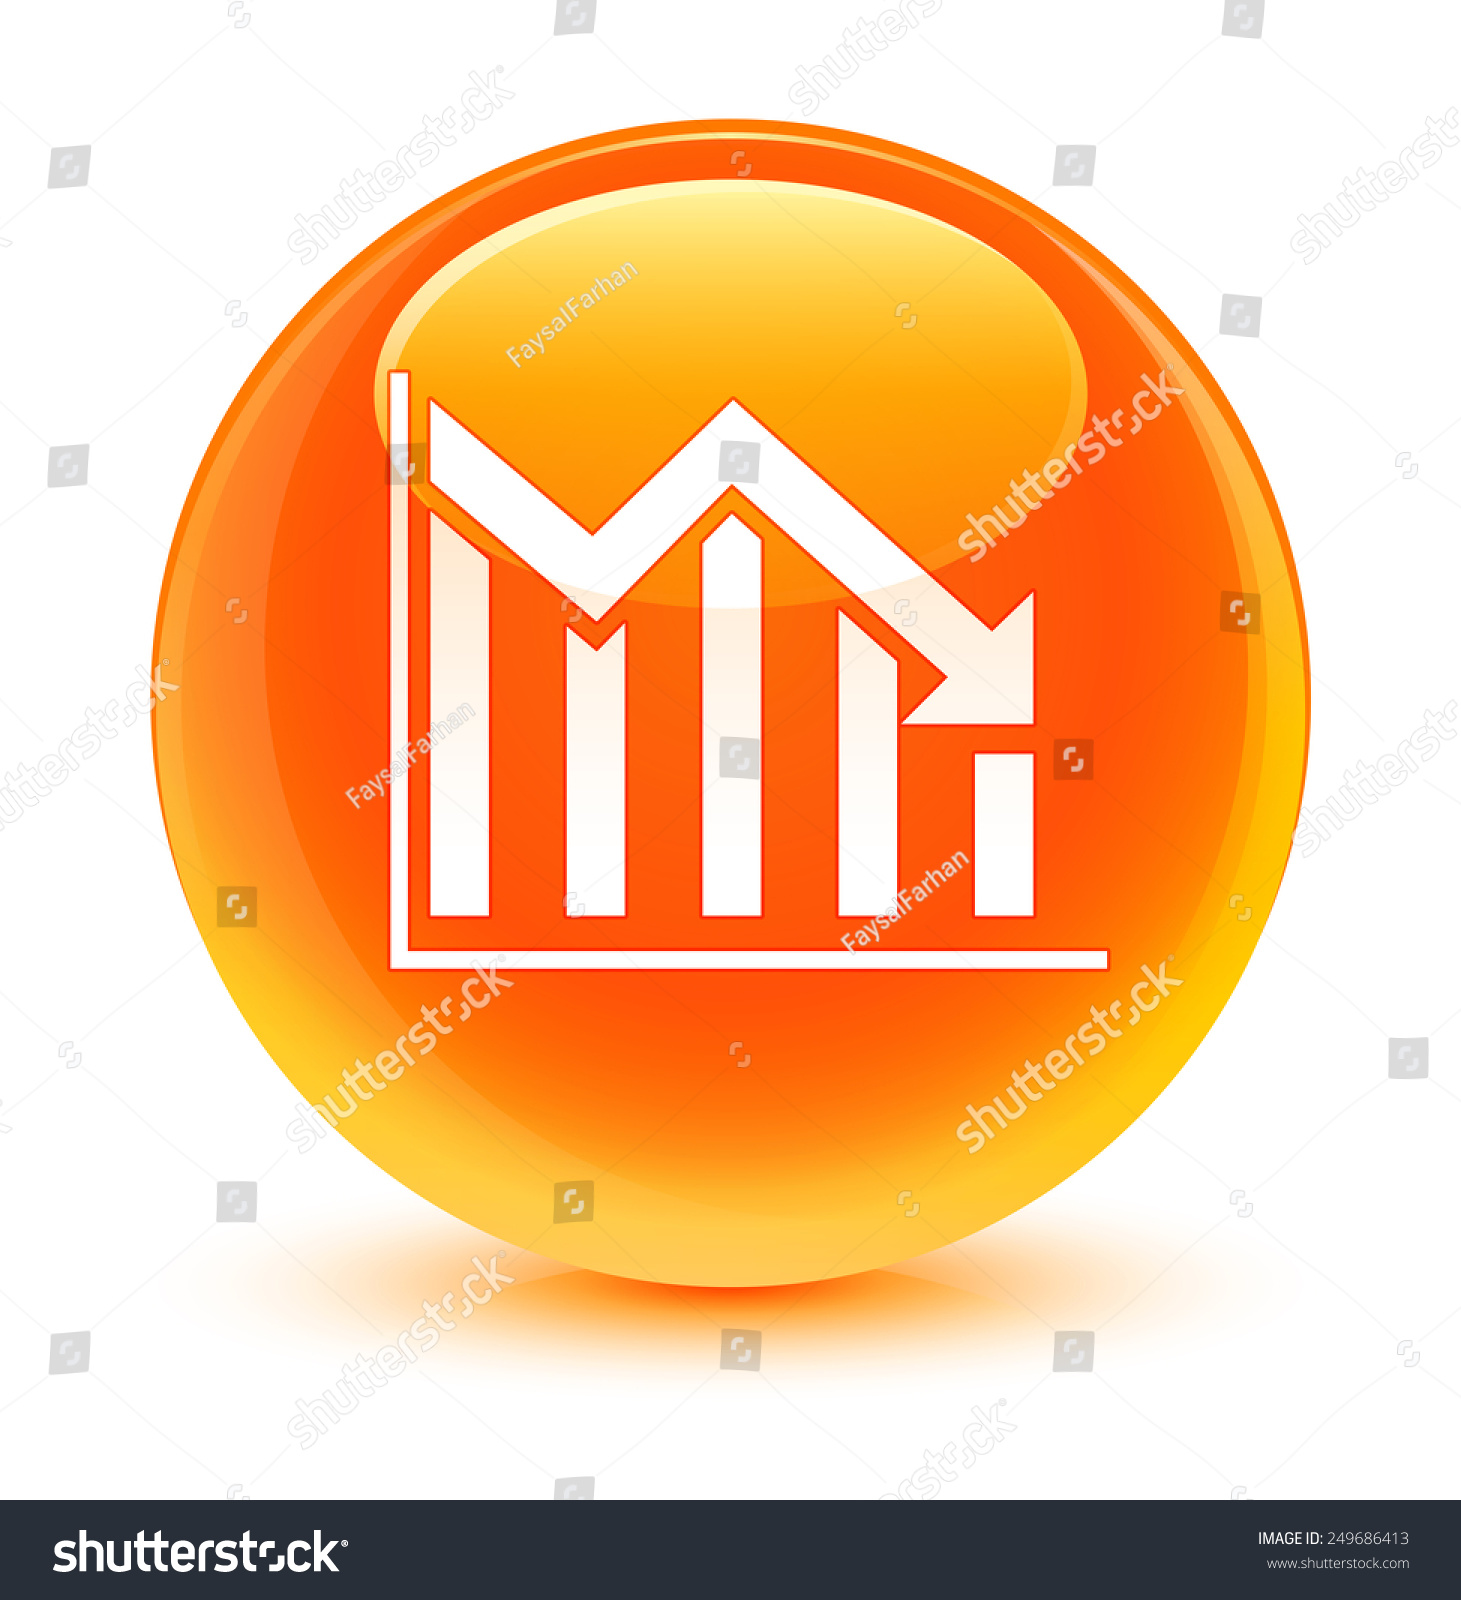 ppt合同结算素材橙色